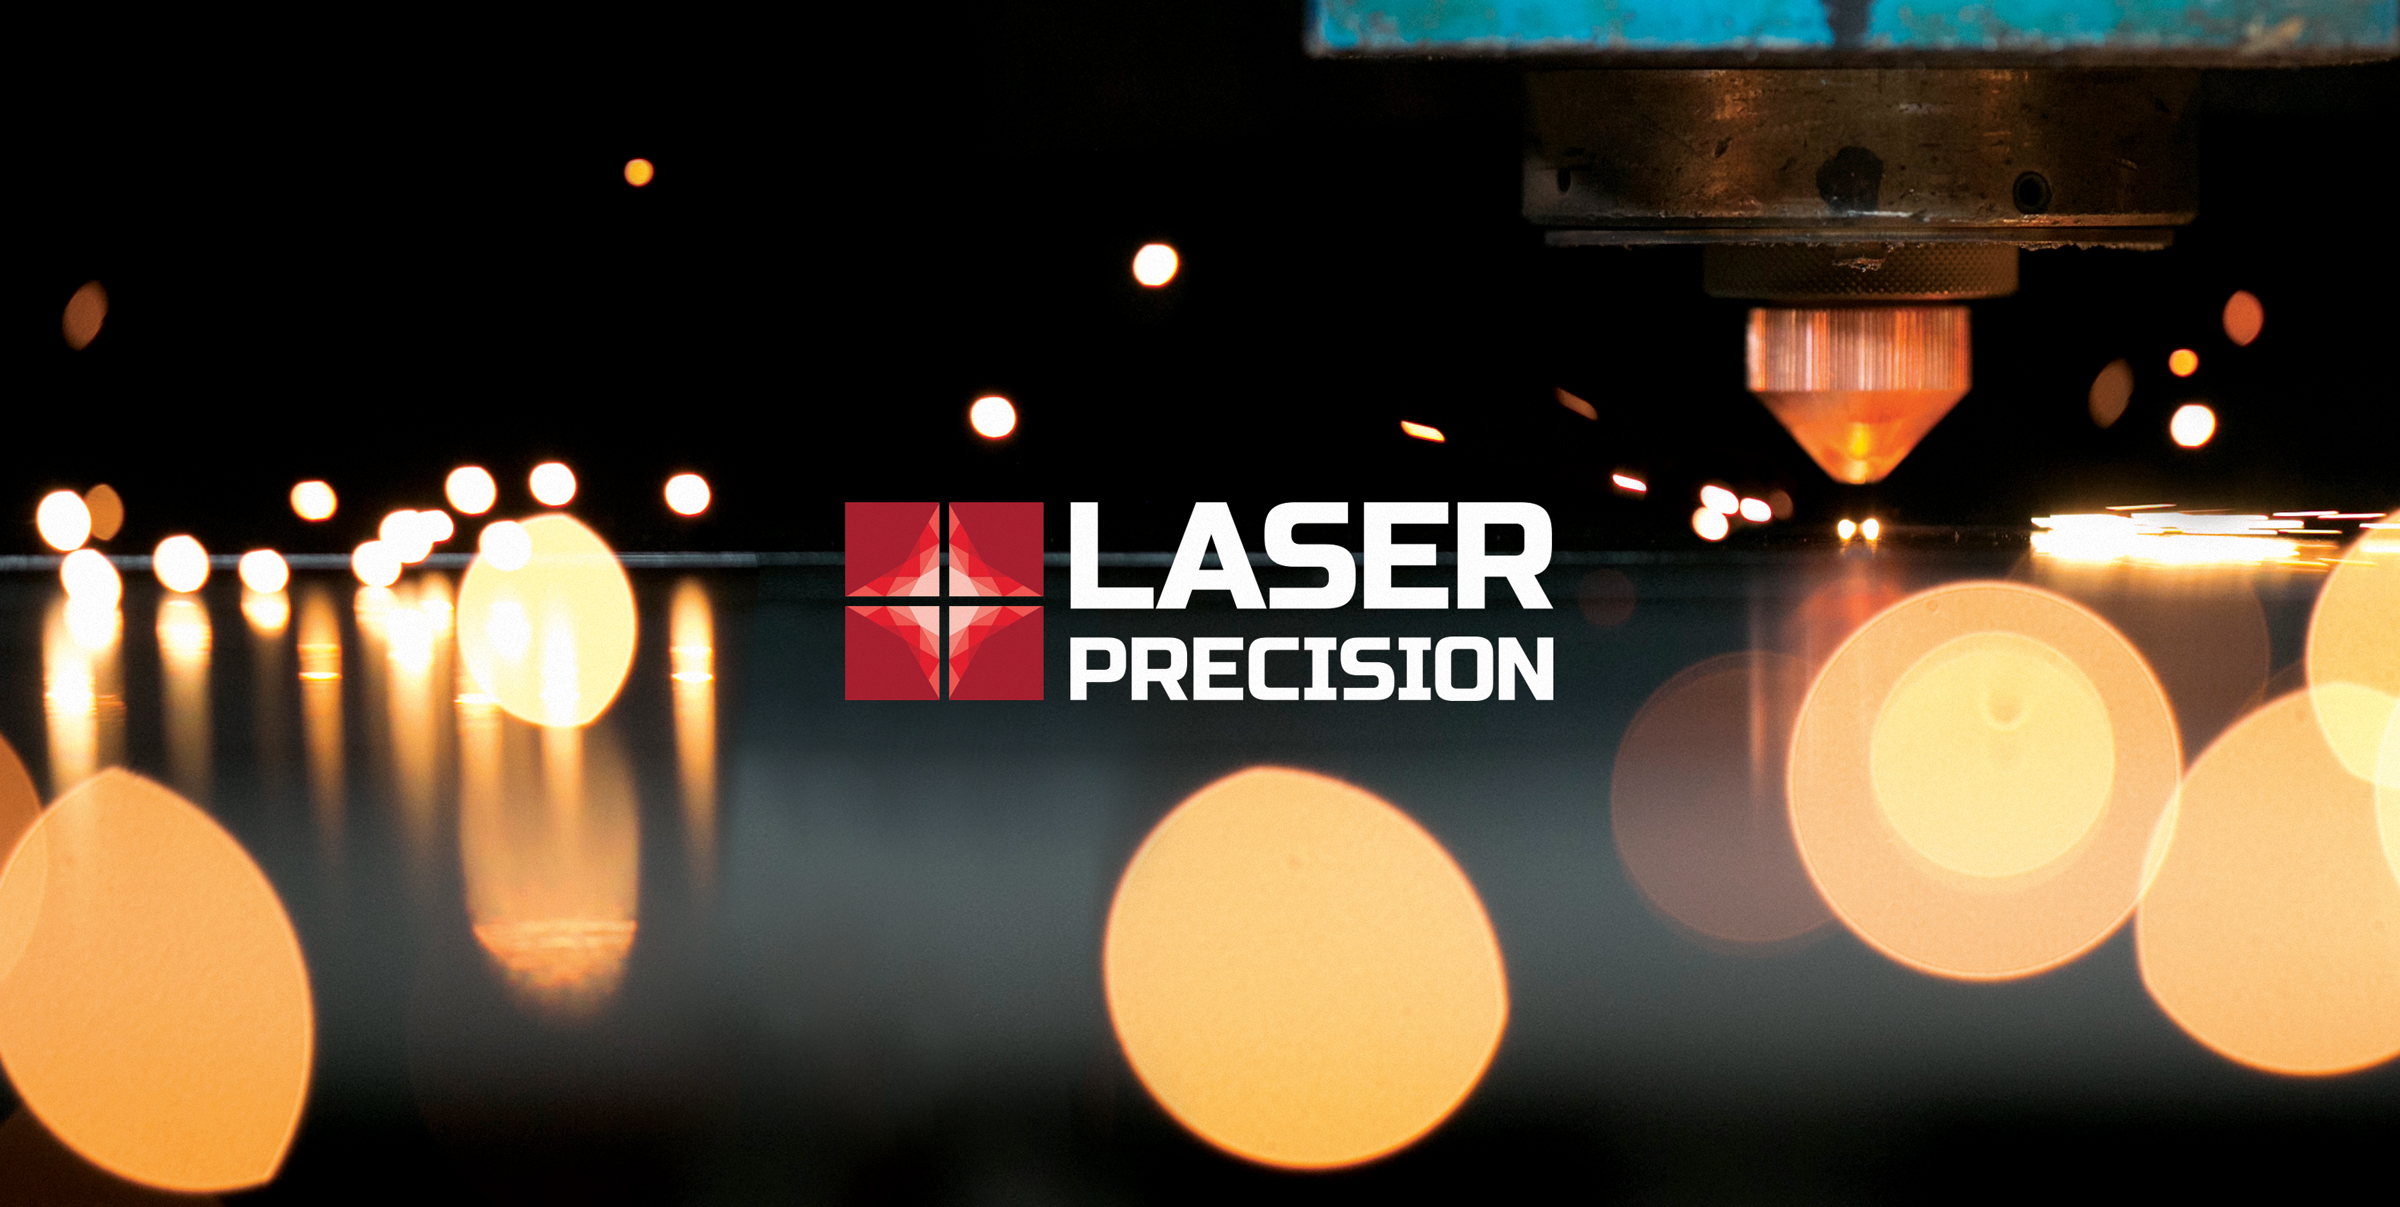 laser-precision-banner.jpg